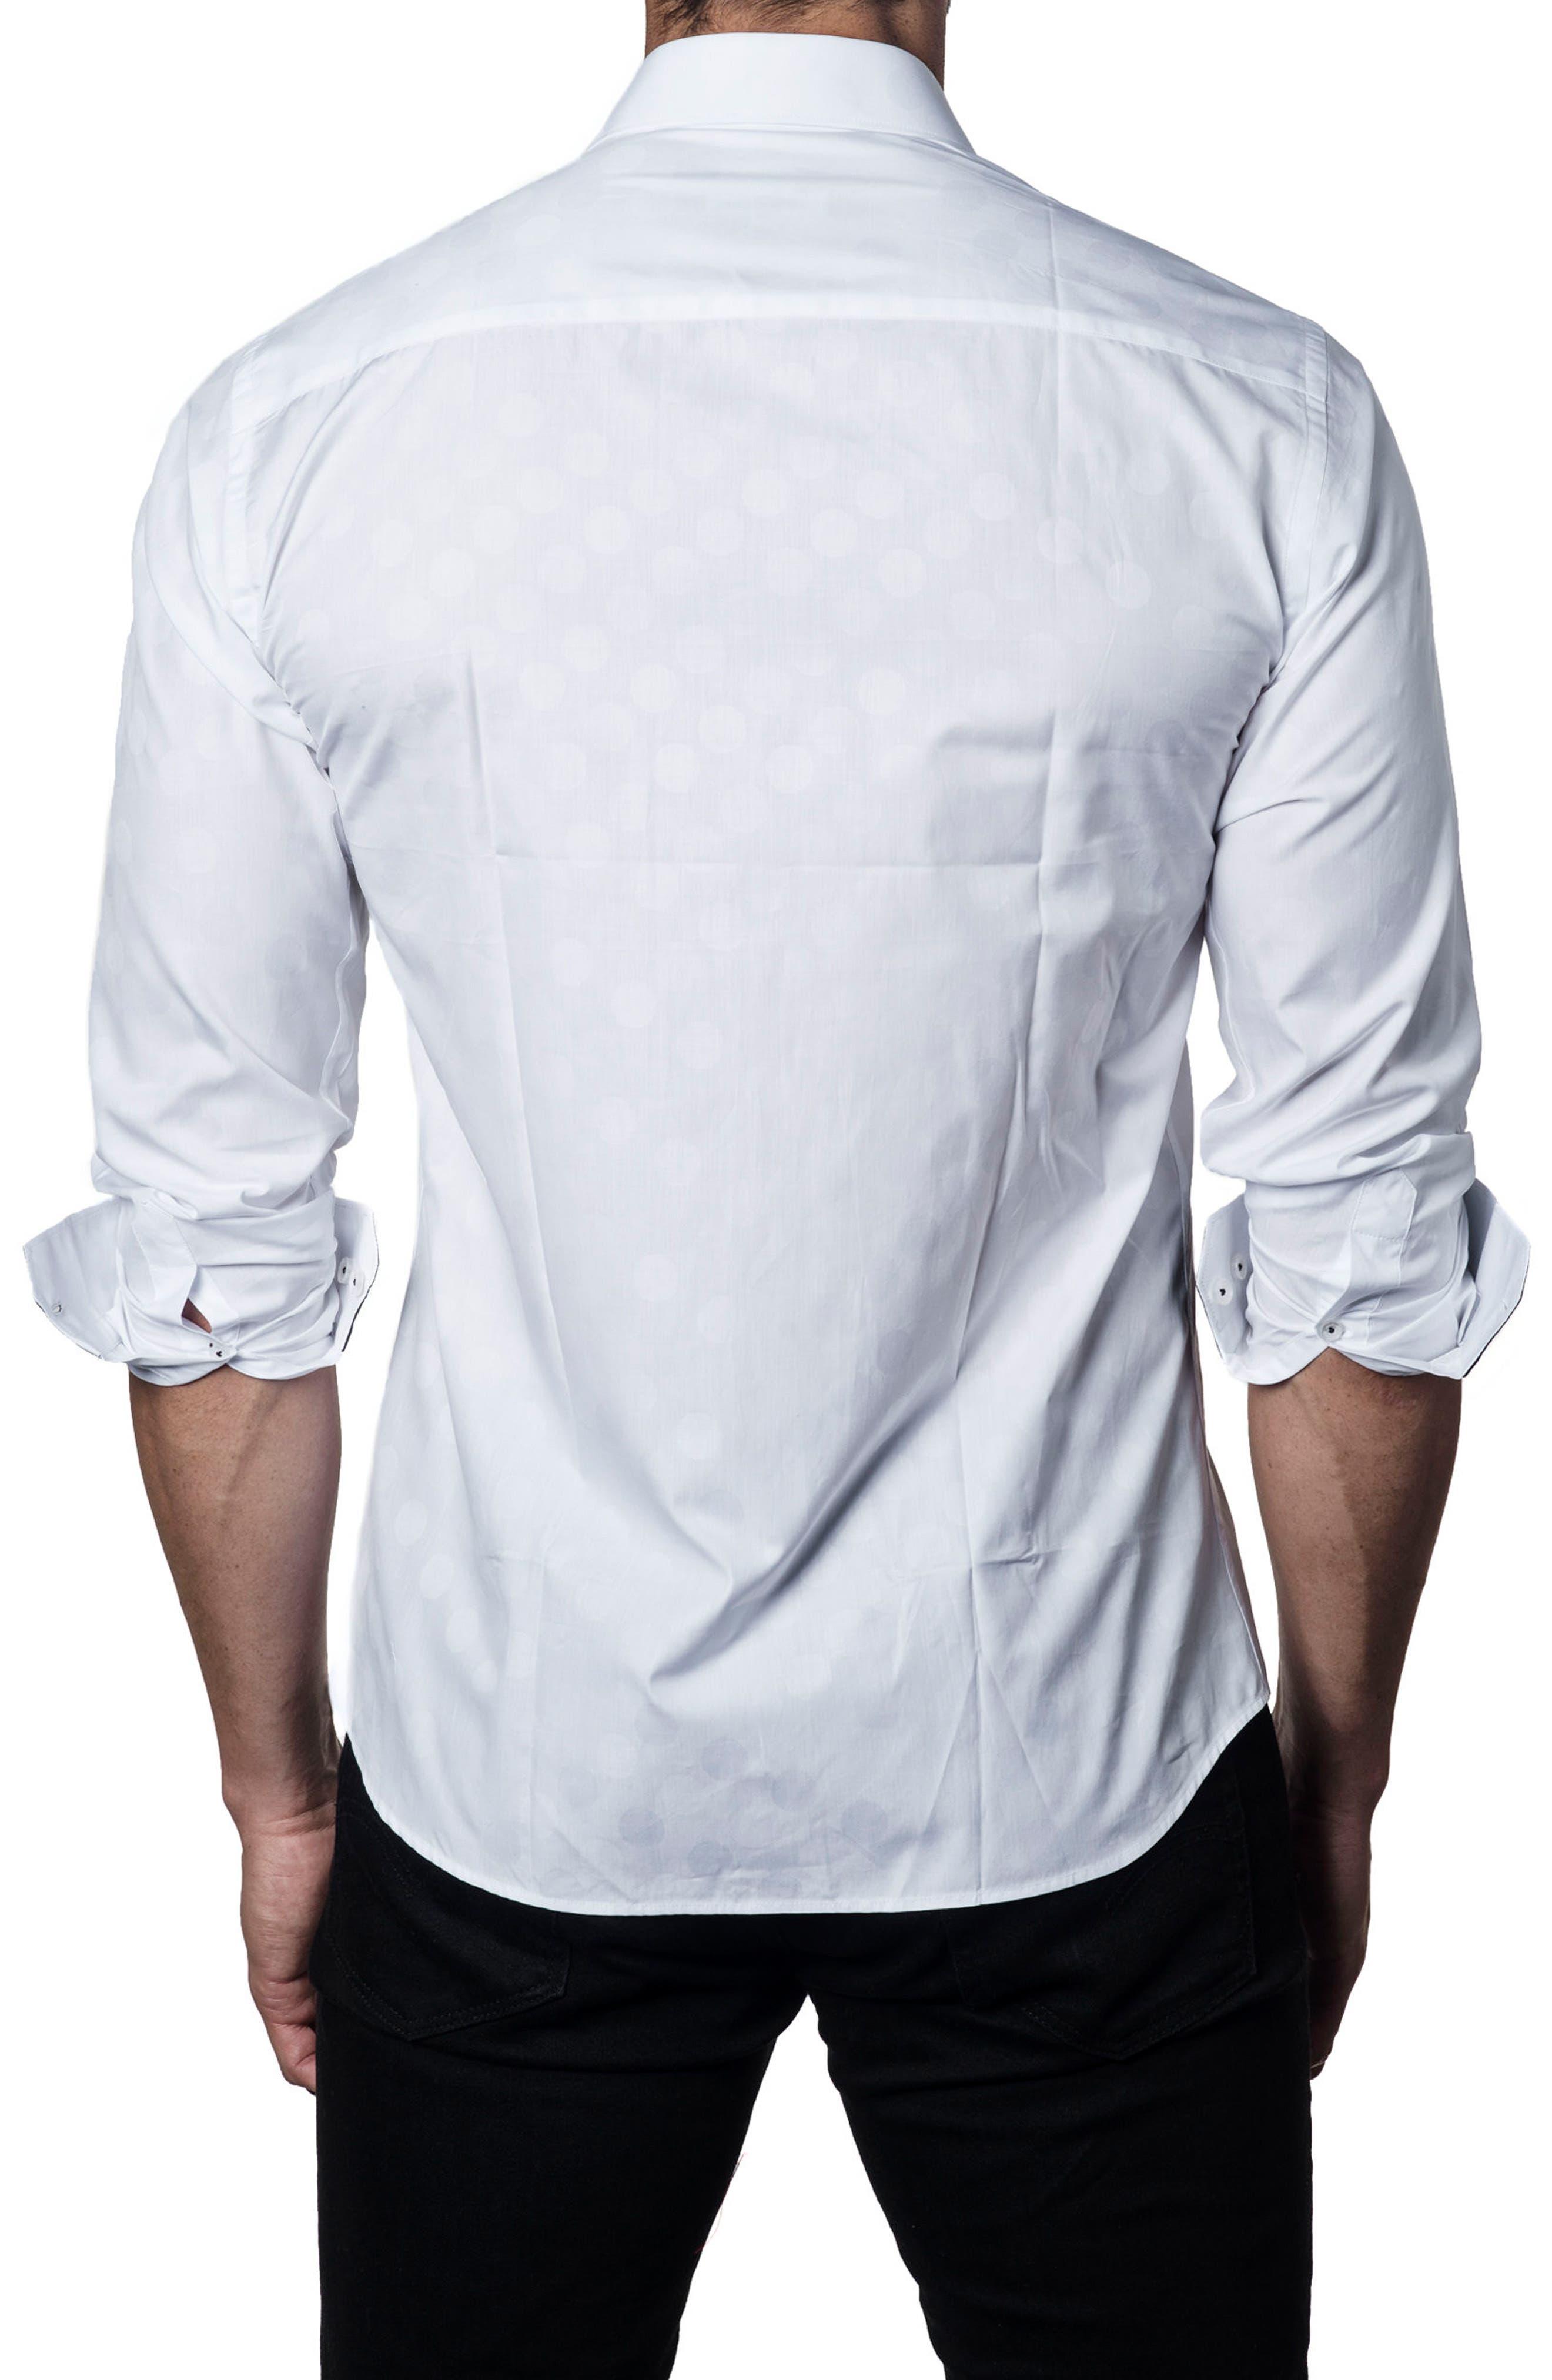 Solid Sport Shirt,                             Alternate thumbnail 2, color,                             White Polka Dot Jacquard